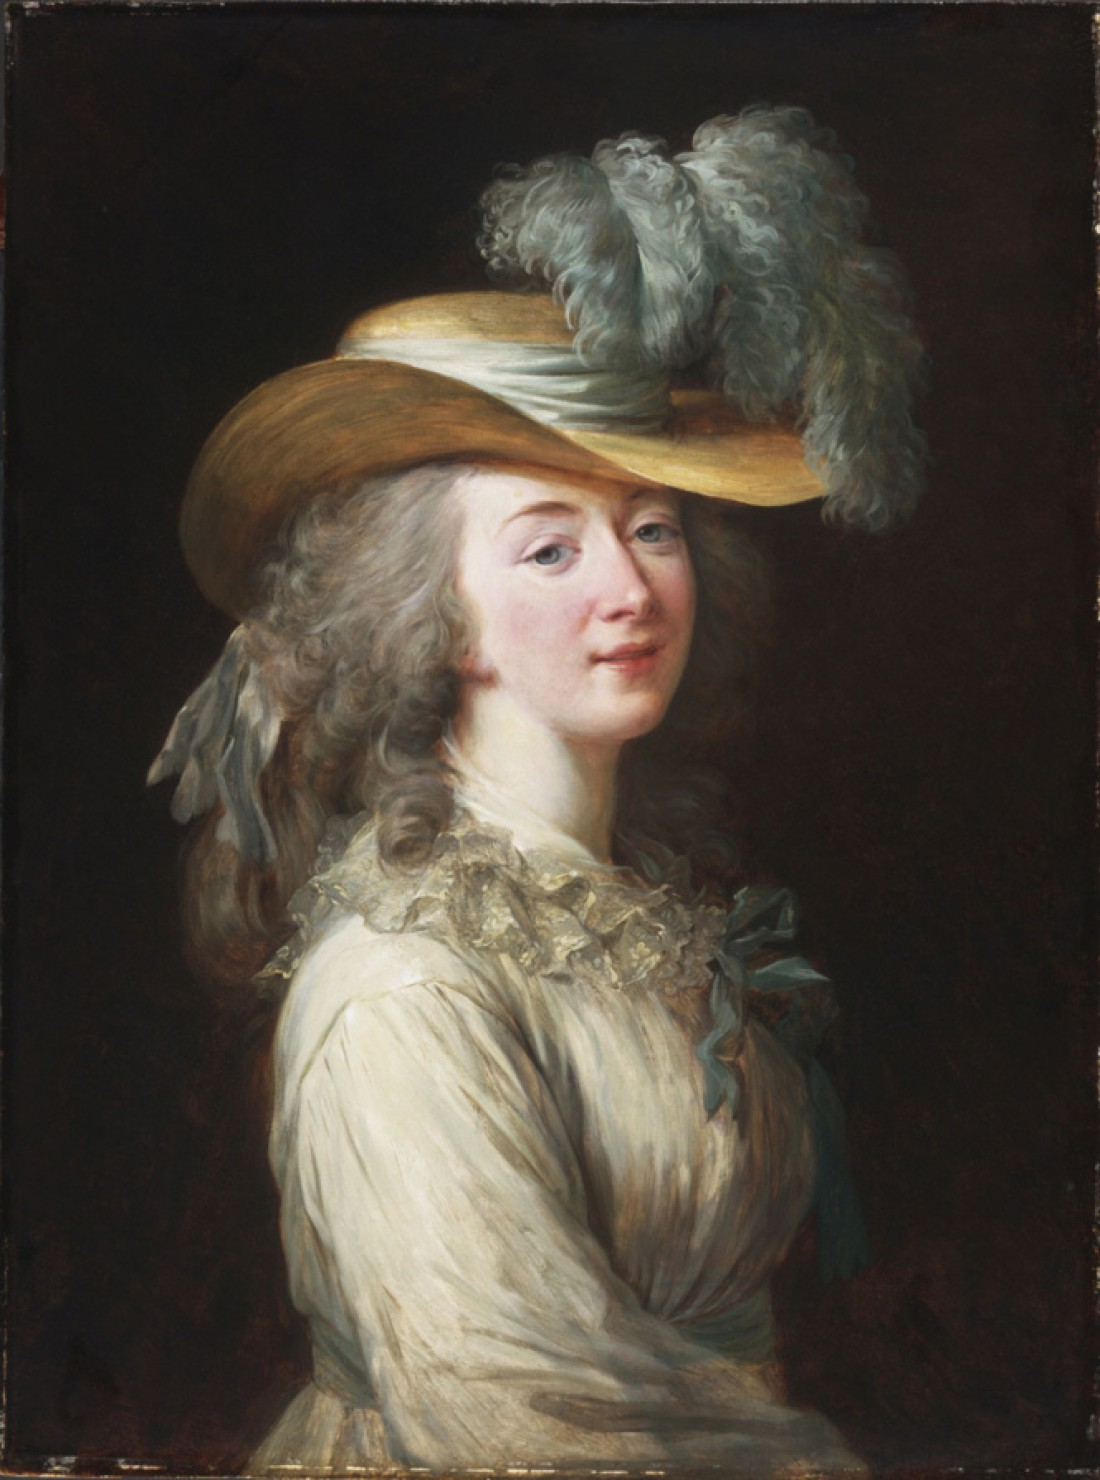 Мари Жанна Дюбарри. Любимая любовница и подруга короля Франции Людовика XV